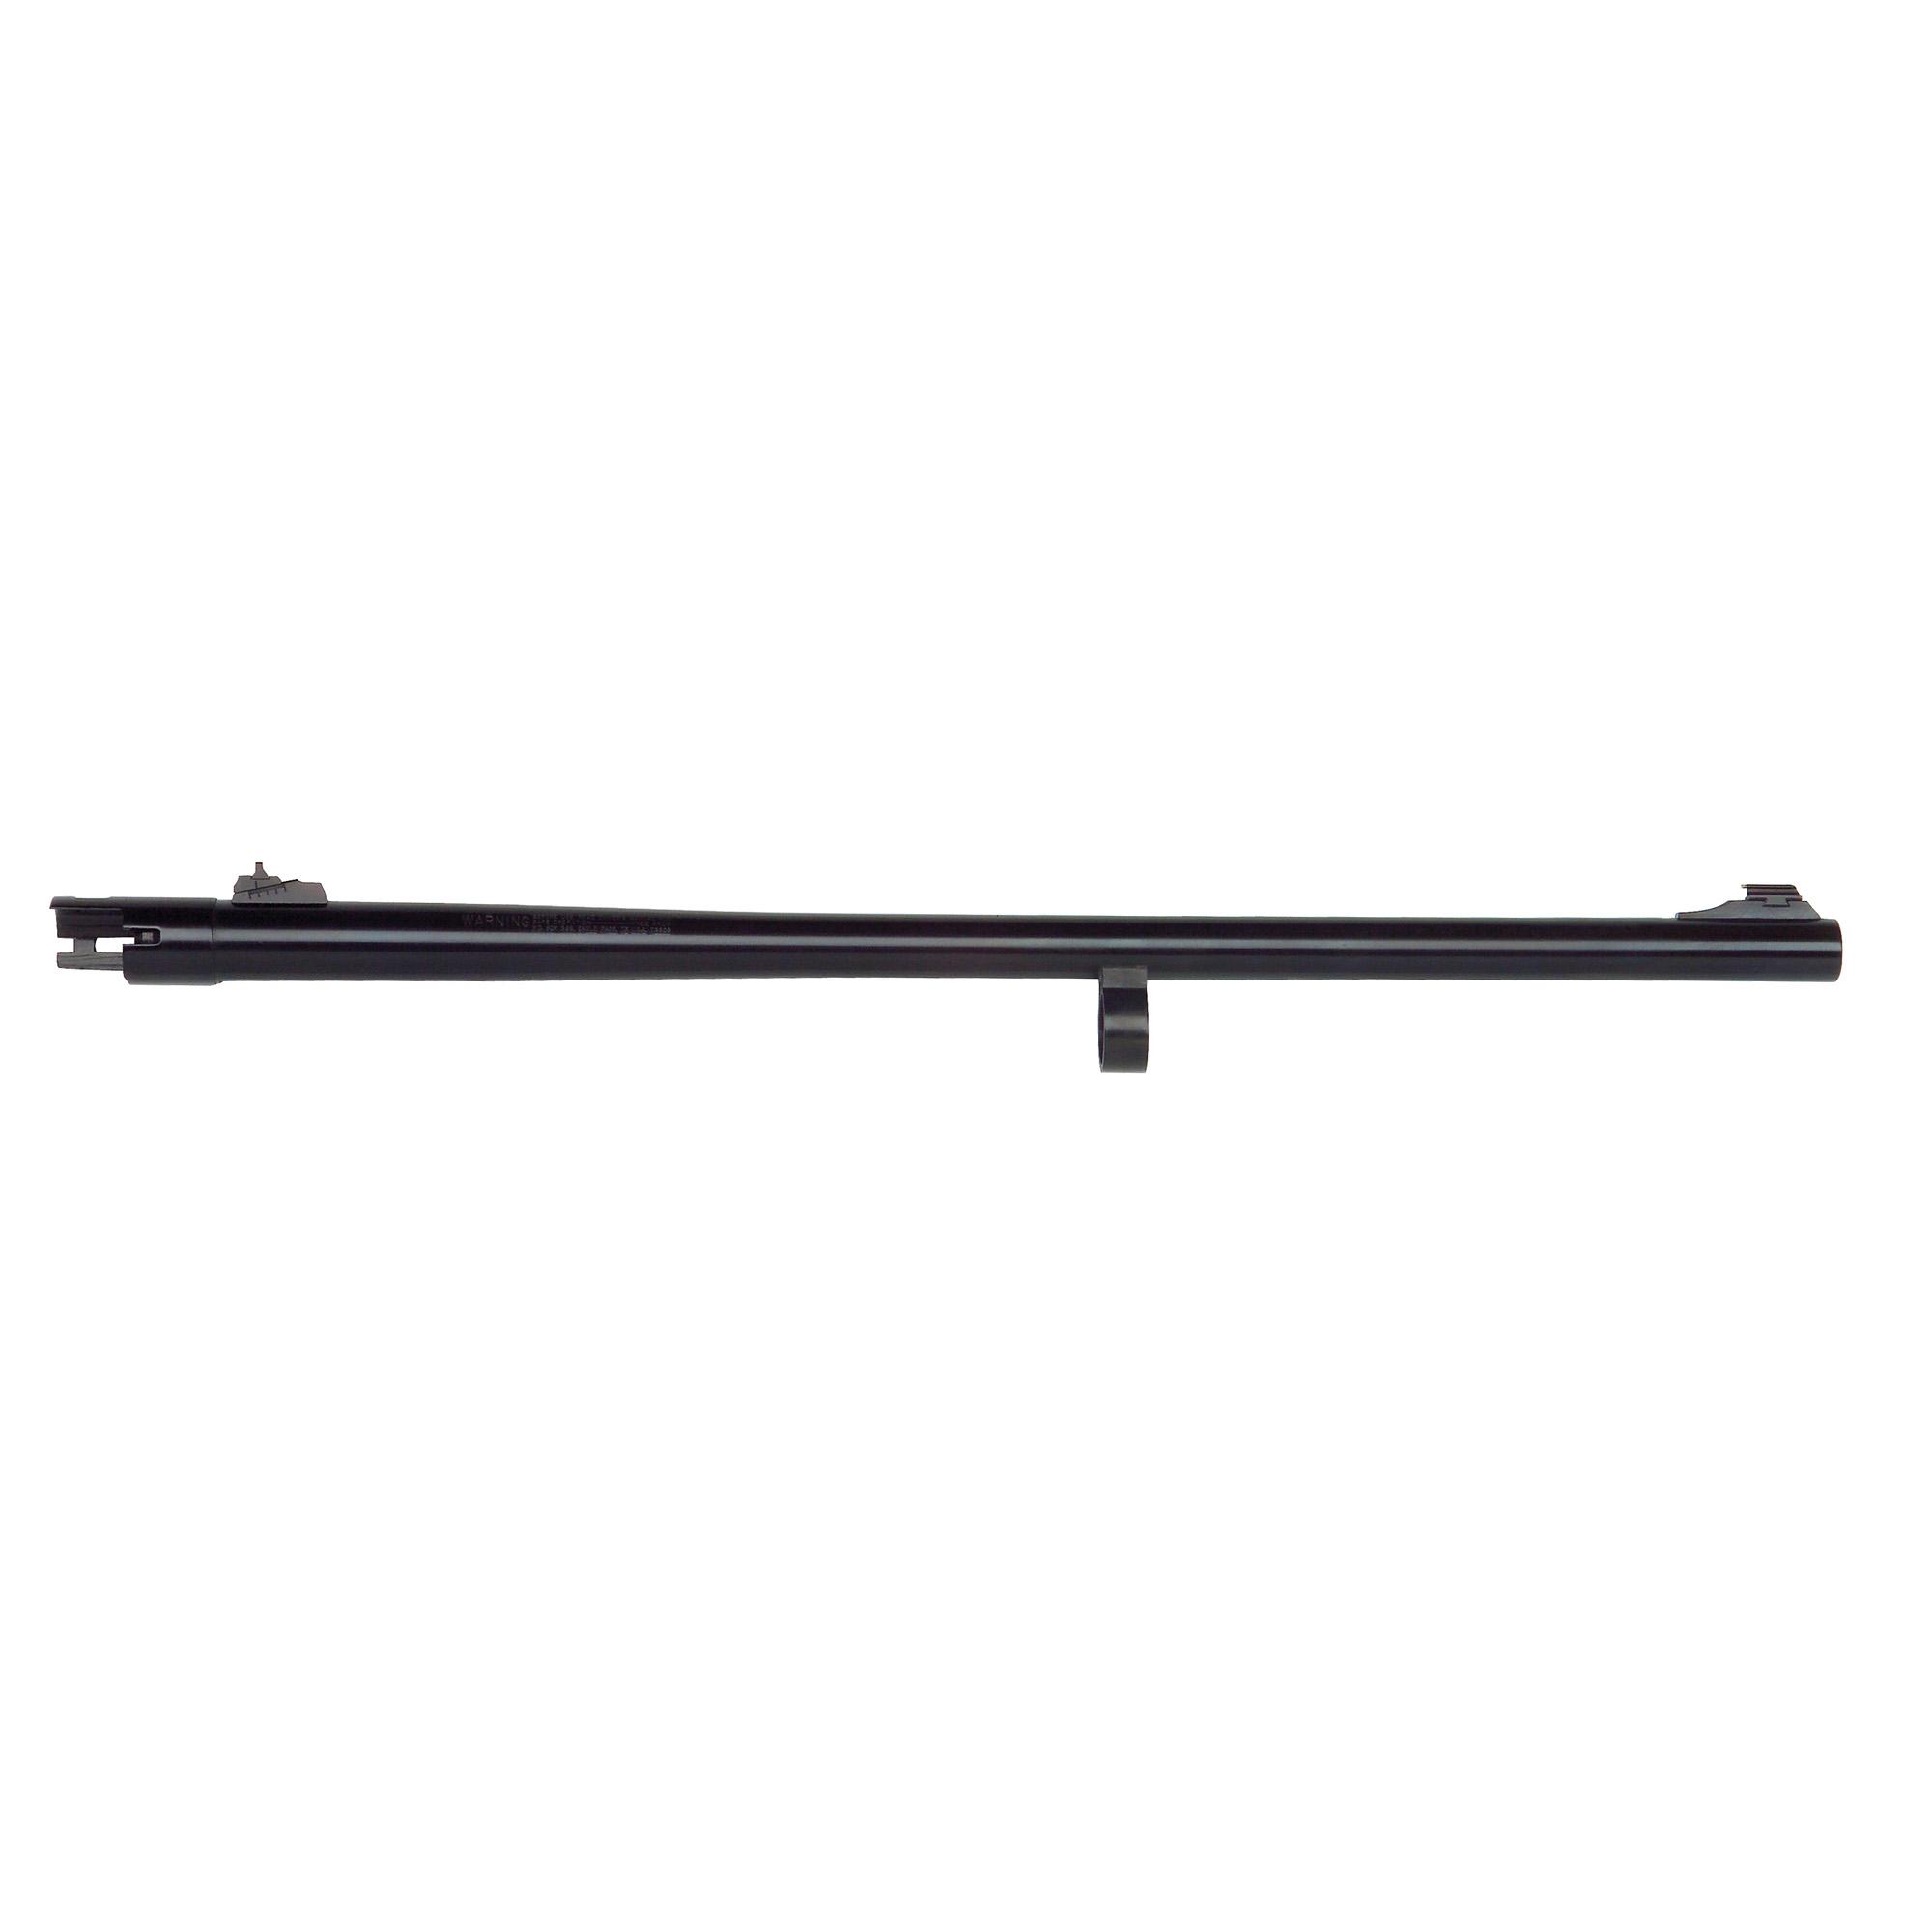 "Remington 870 12 Gauge"" 24"" Slug barrel with adjustable rifle sights"" fully-rifled bore"" and blued finish."